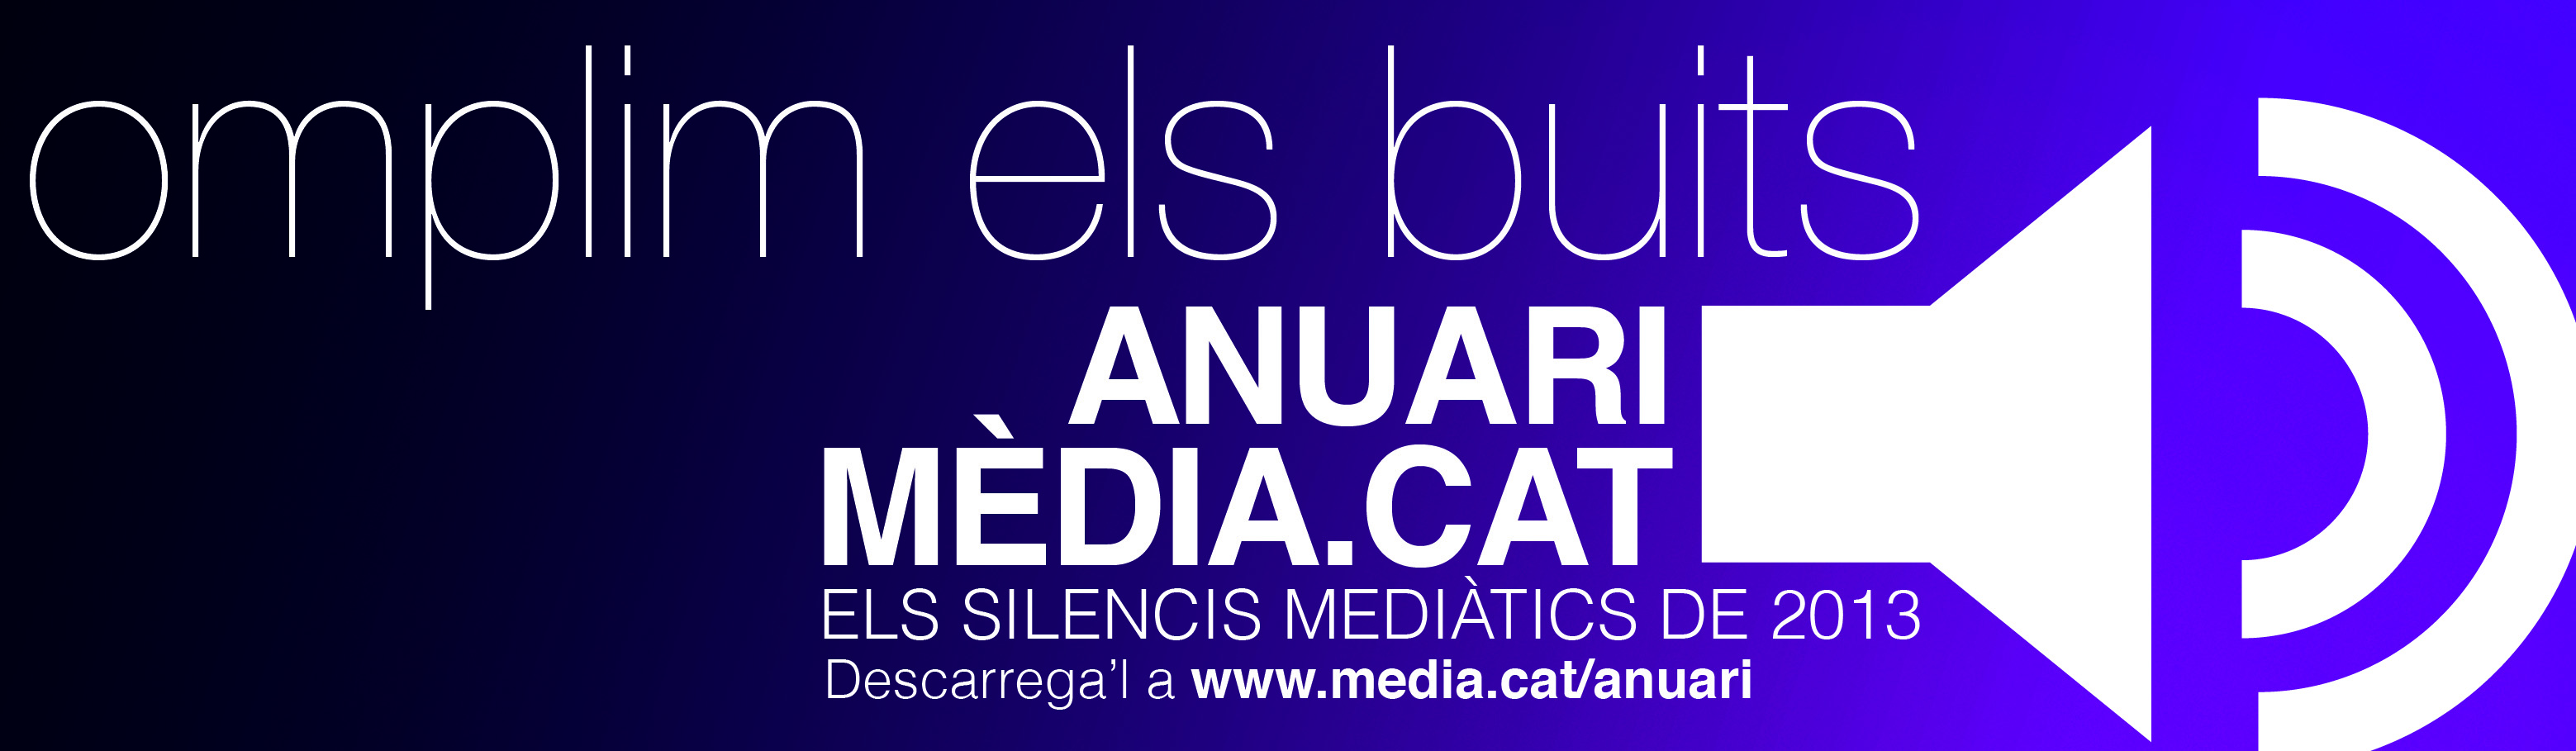 anuncio Anuario 2013 con web